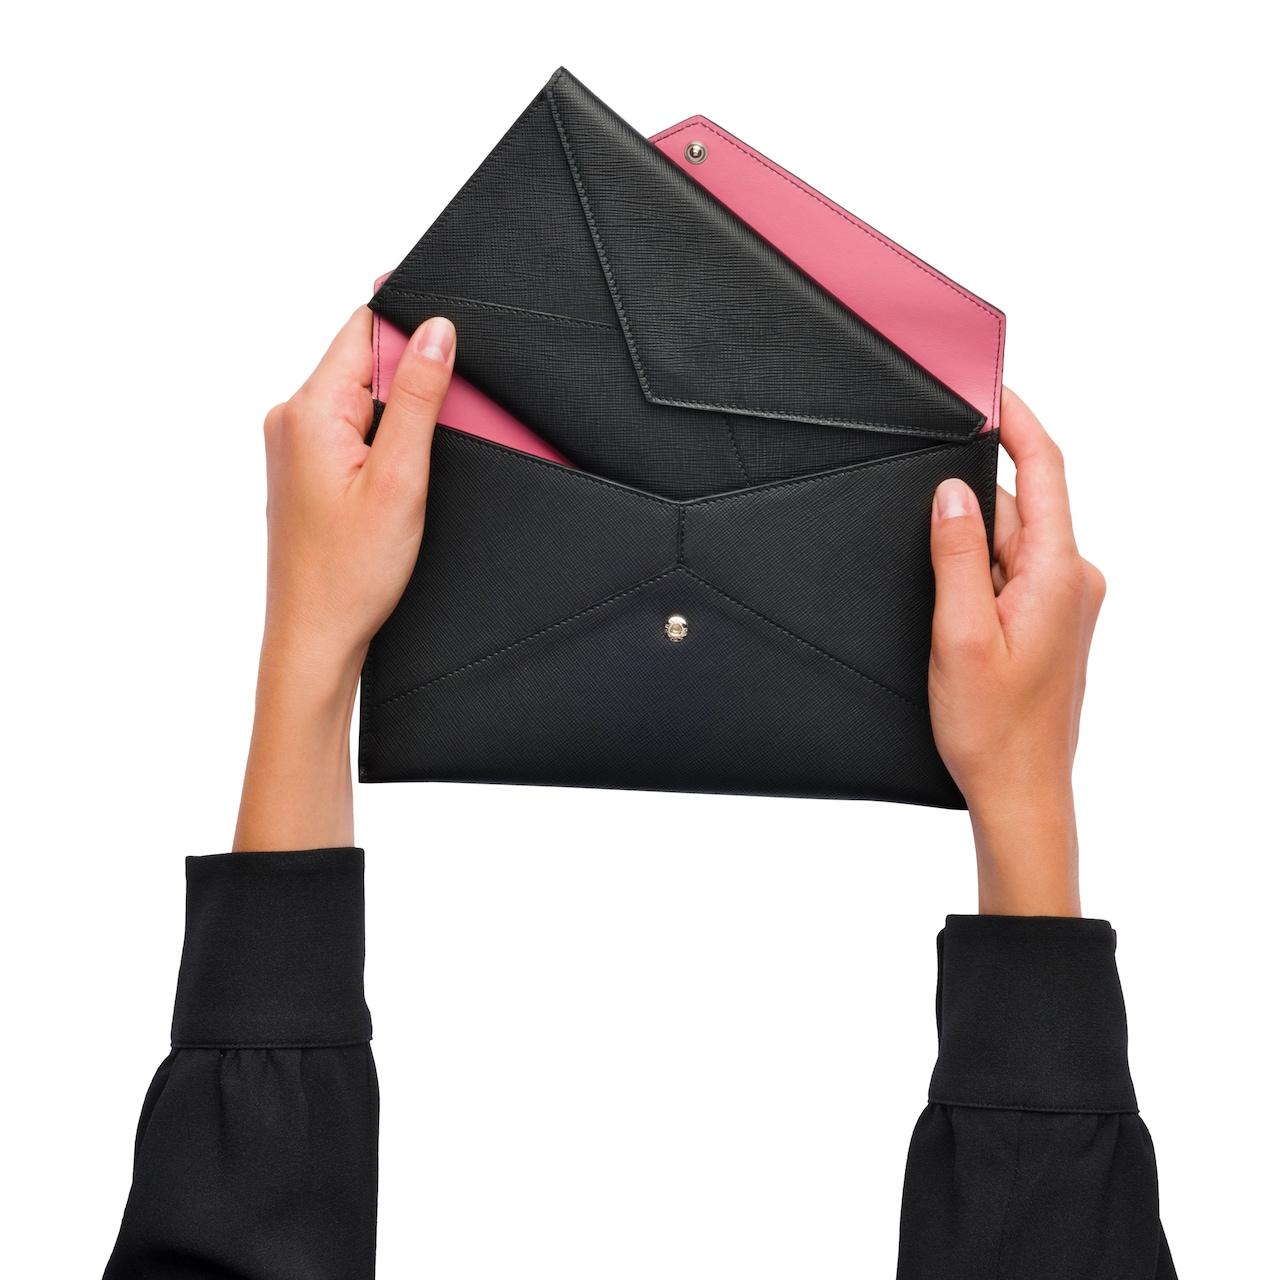 Pradamalia leather document holder set